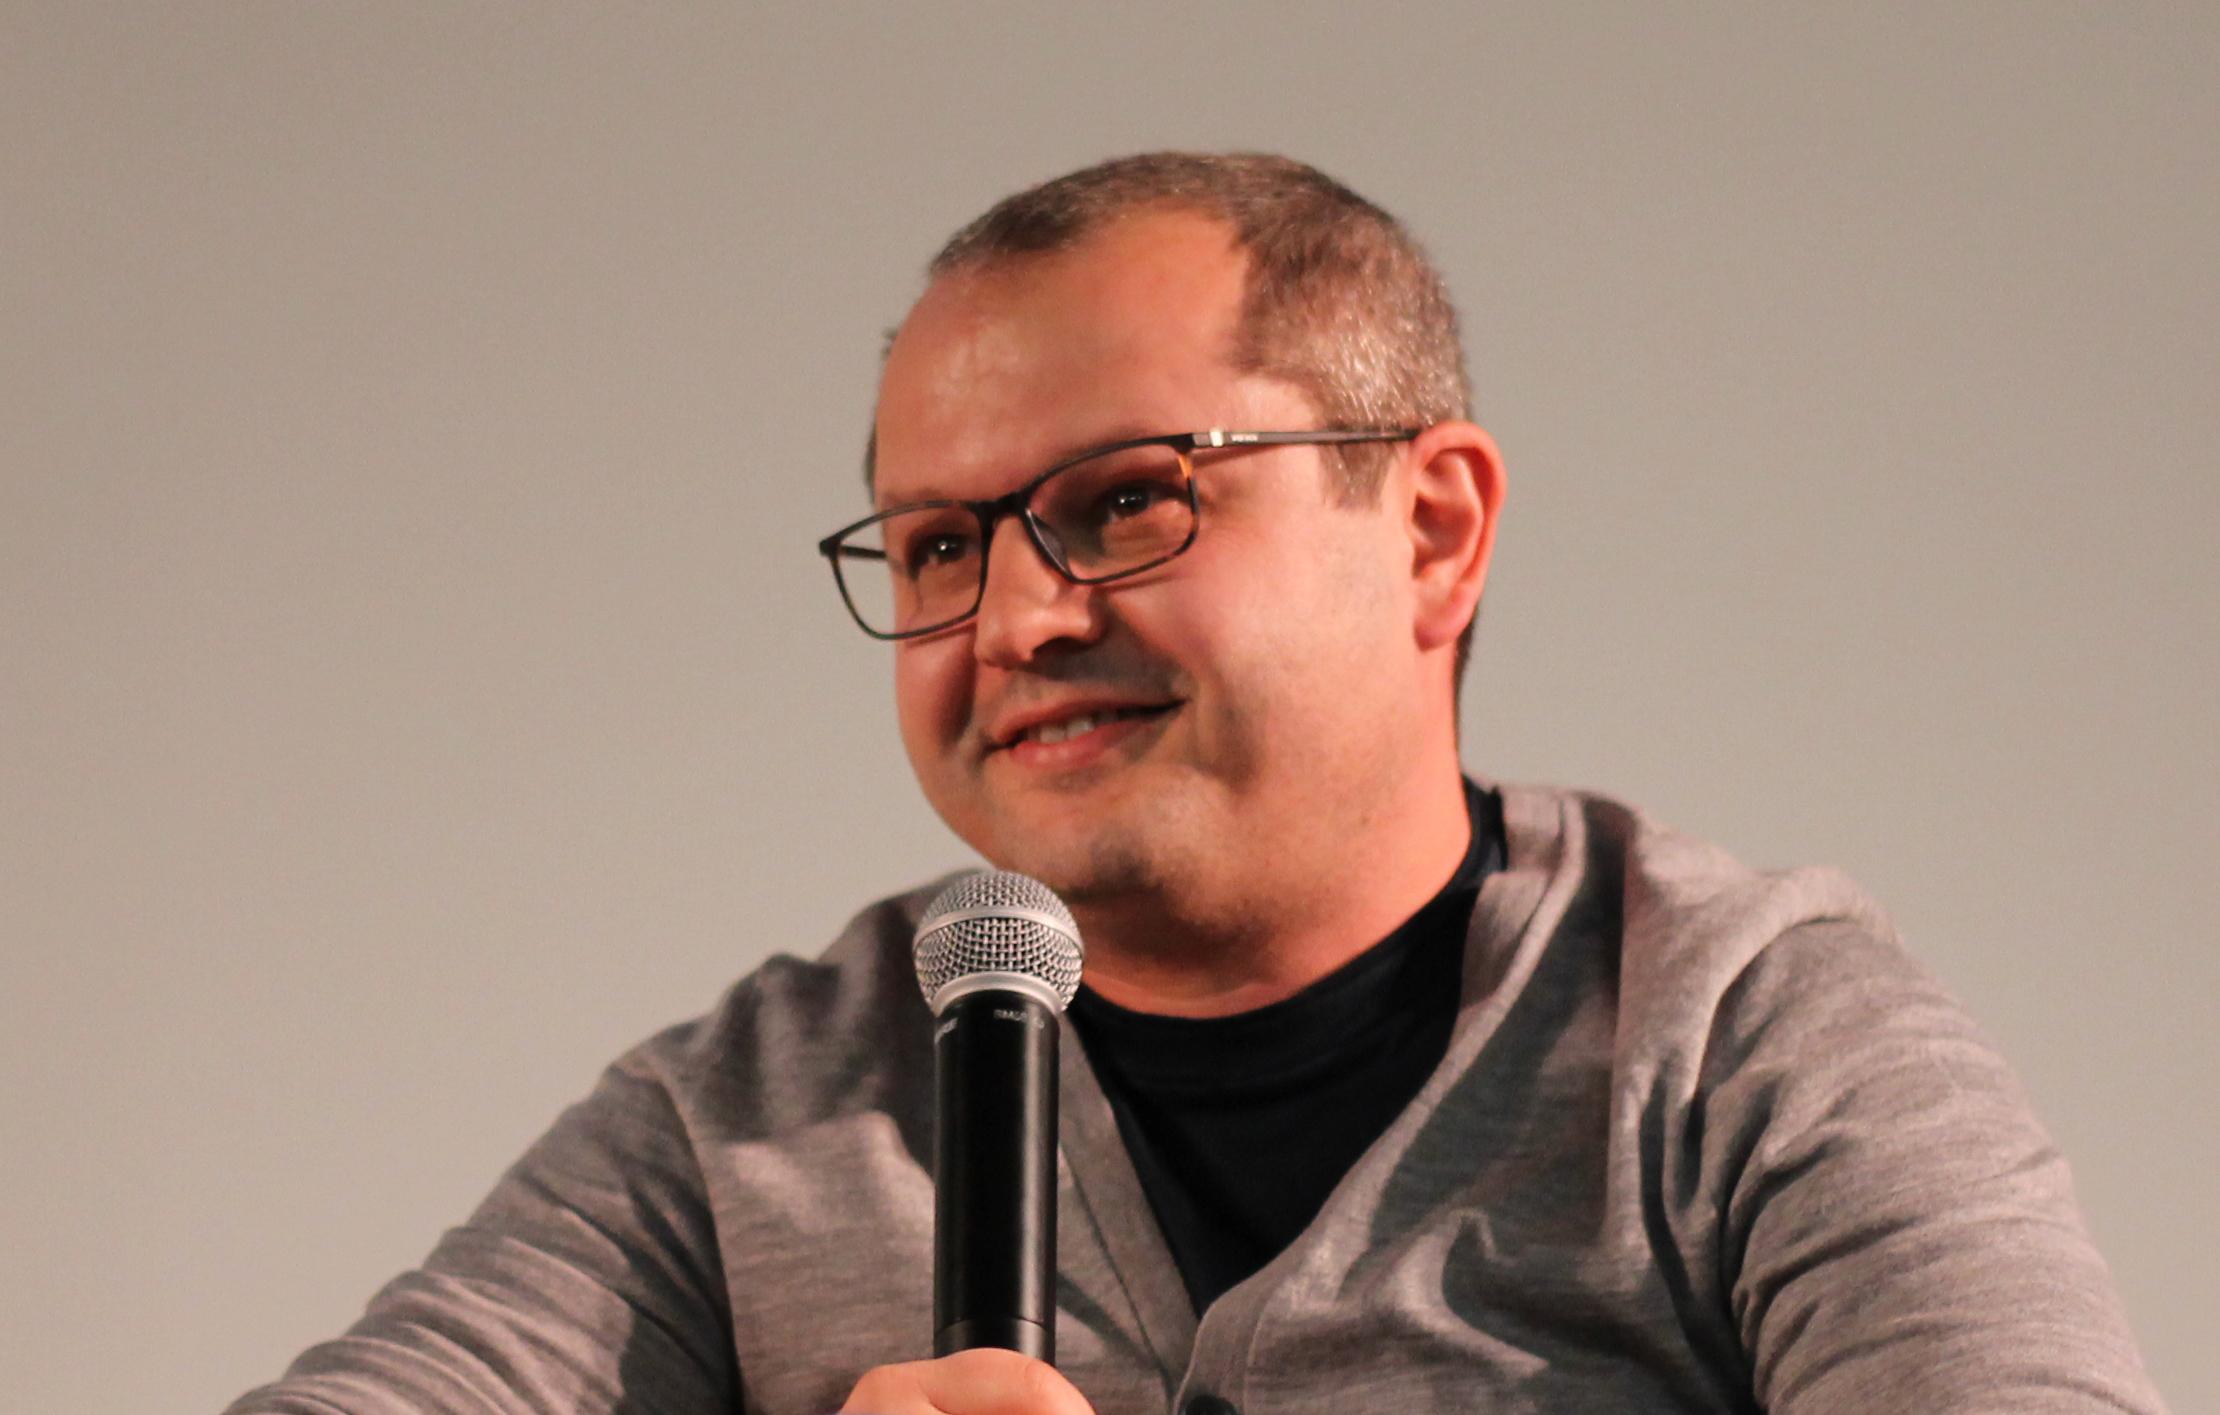 Corneliu Porumboiu at Lisbon Film Festival in 2019